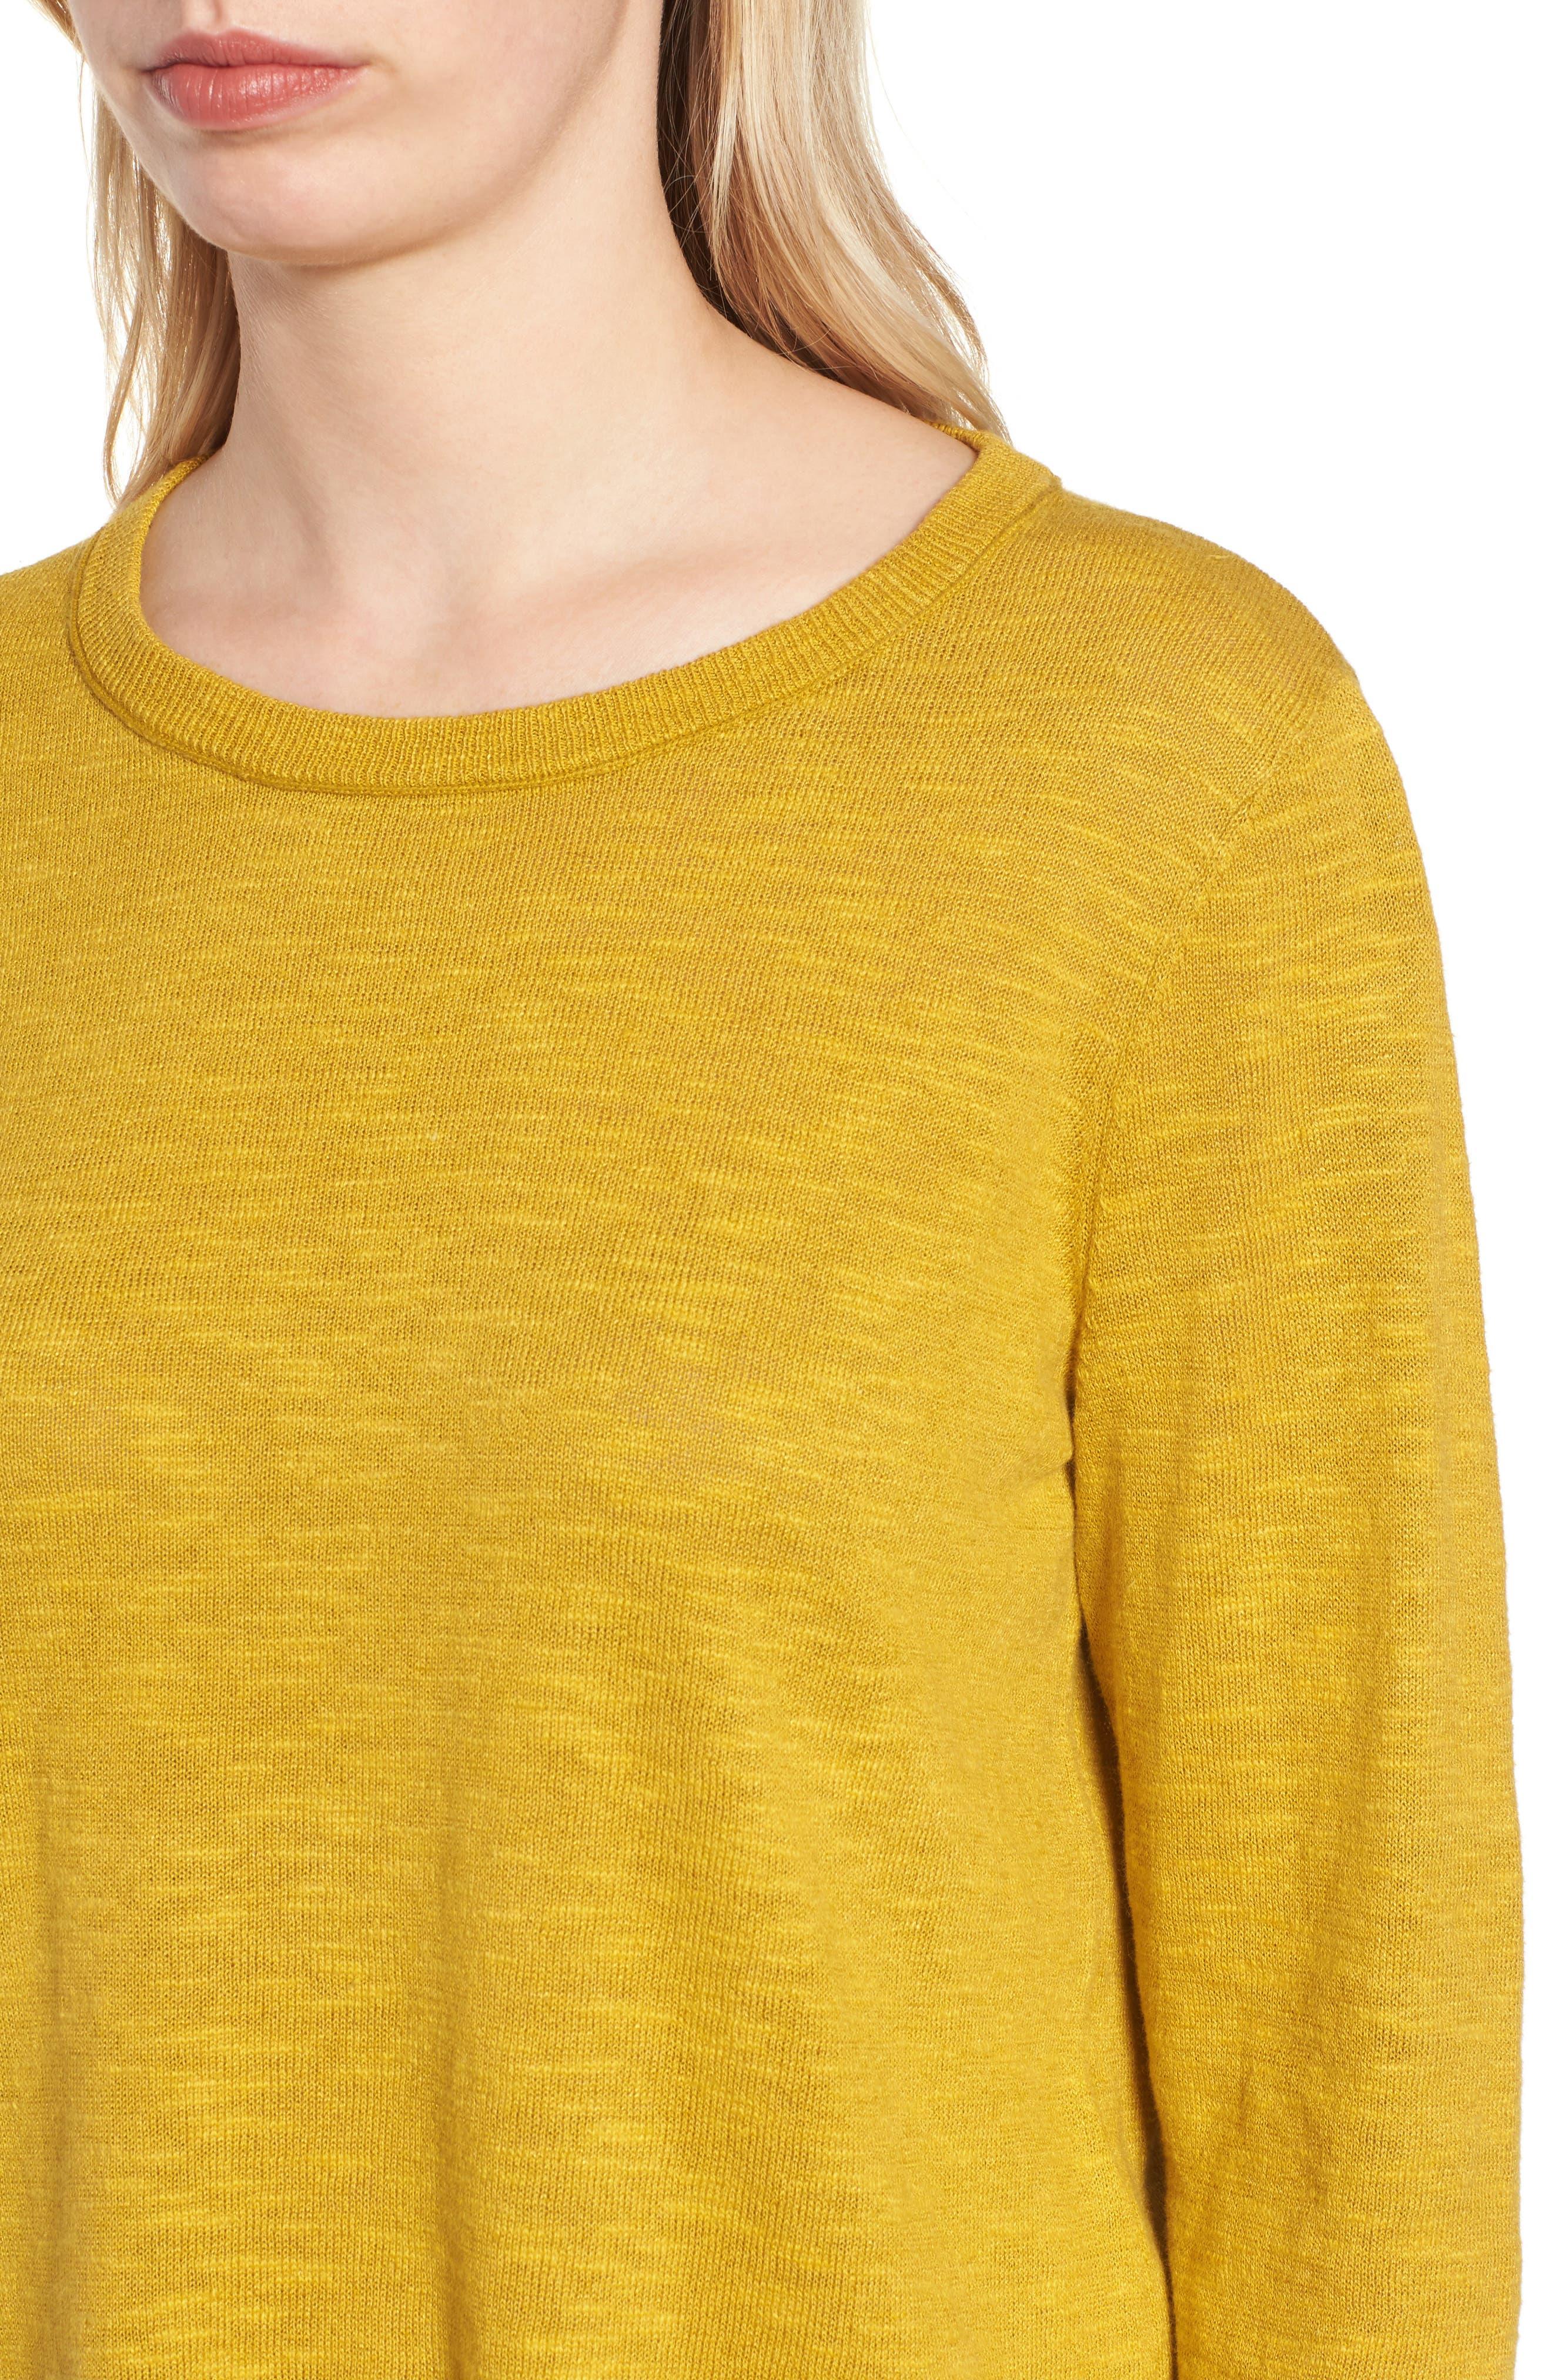 Organic Knit Crewneck Tunic Top,                             Alternate thumbnail 4, color,